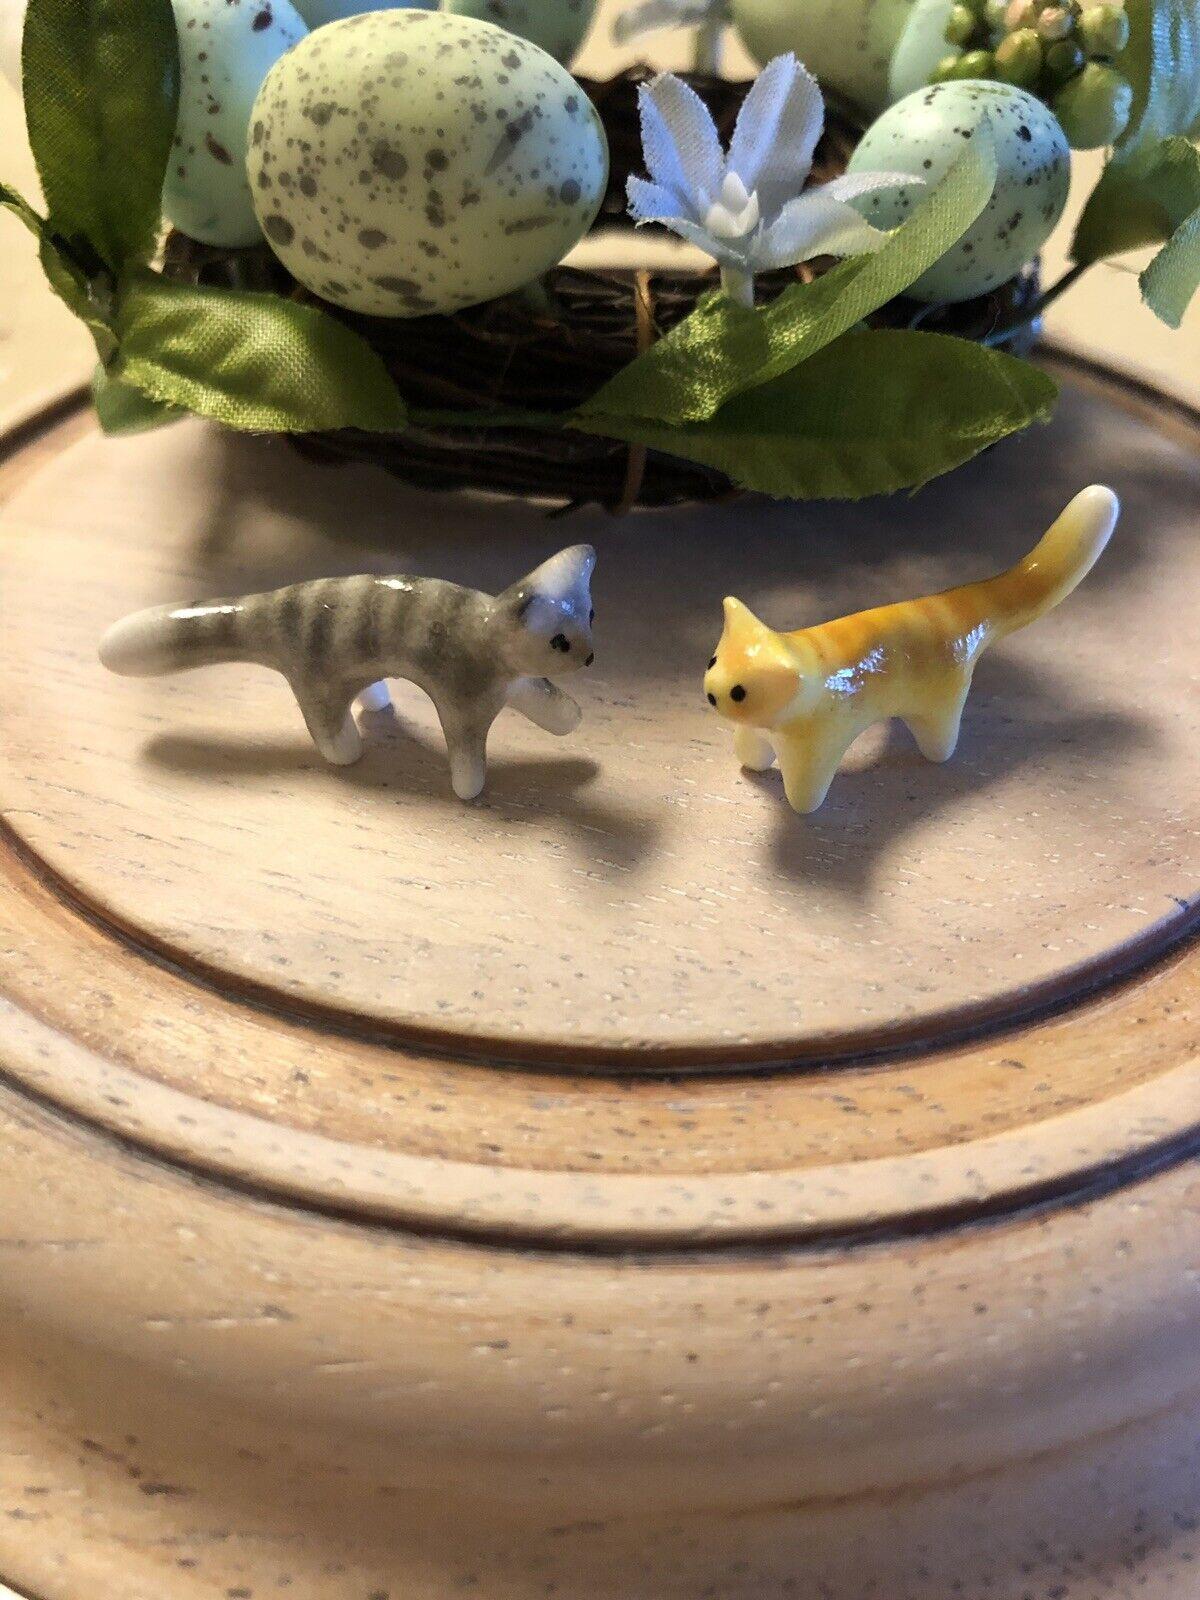 OOAK Miniature Dollhouse Tiny Striped 1 12 Tabby Cats Handmade Original Figurine